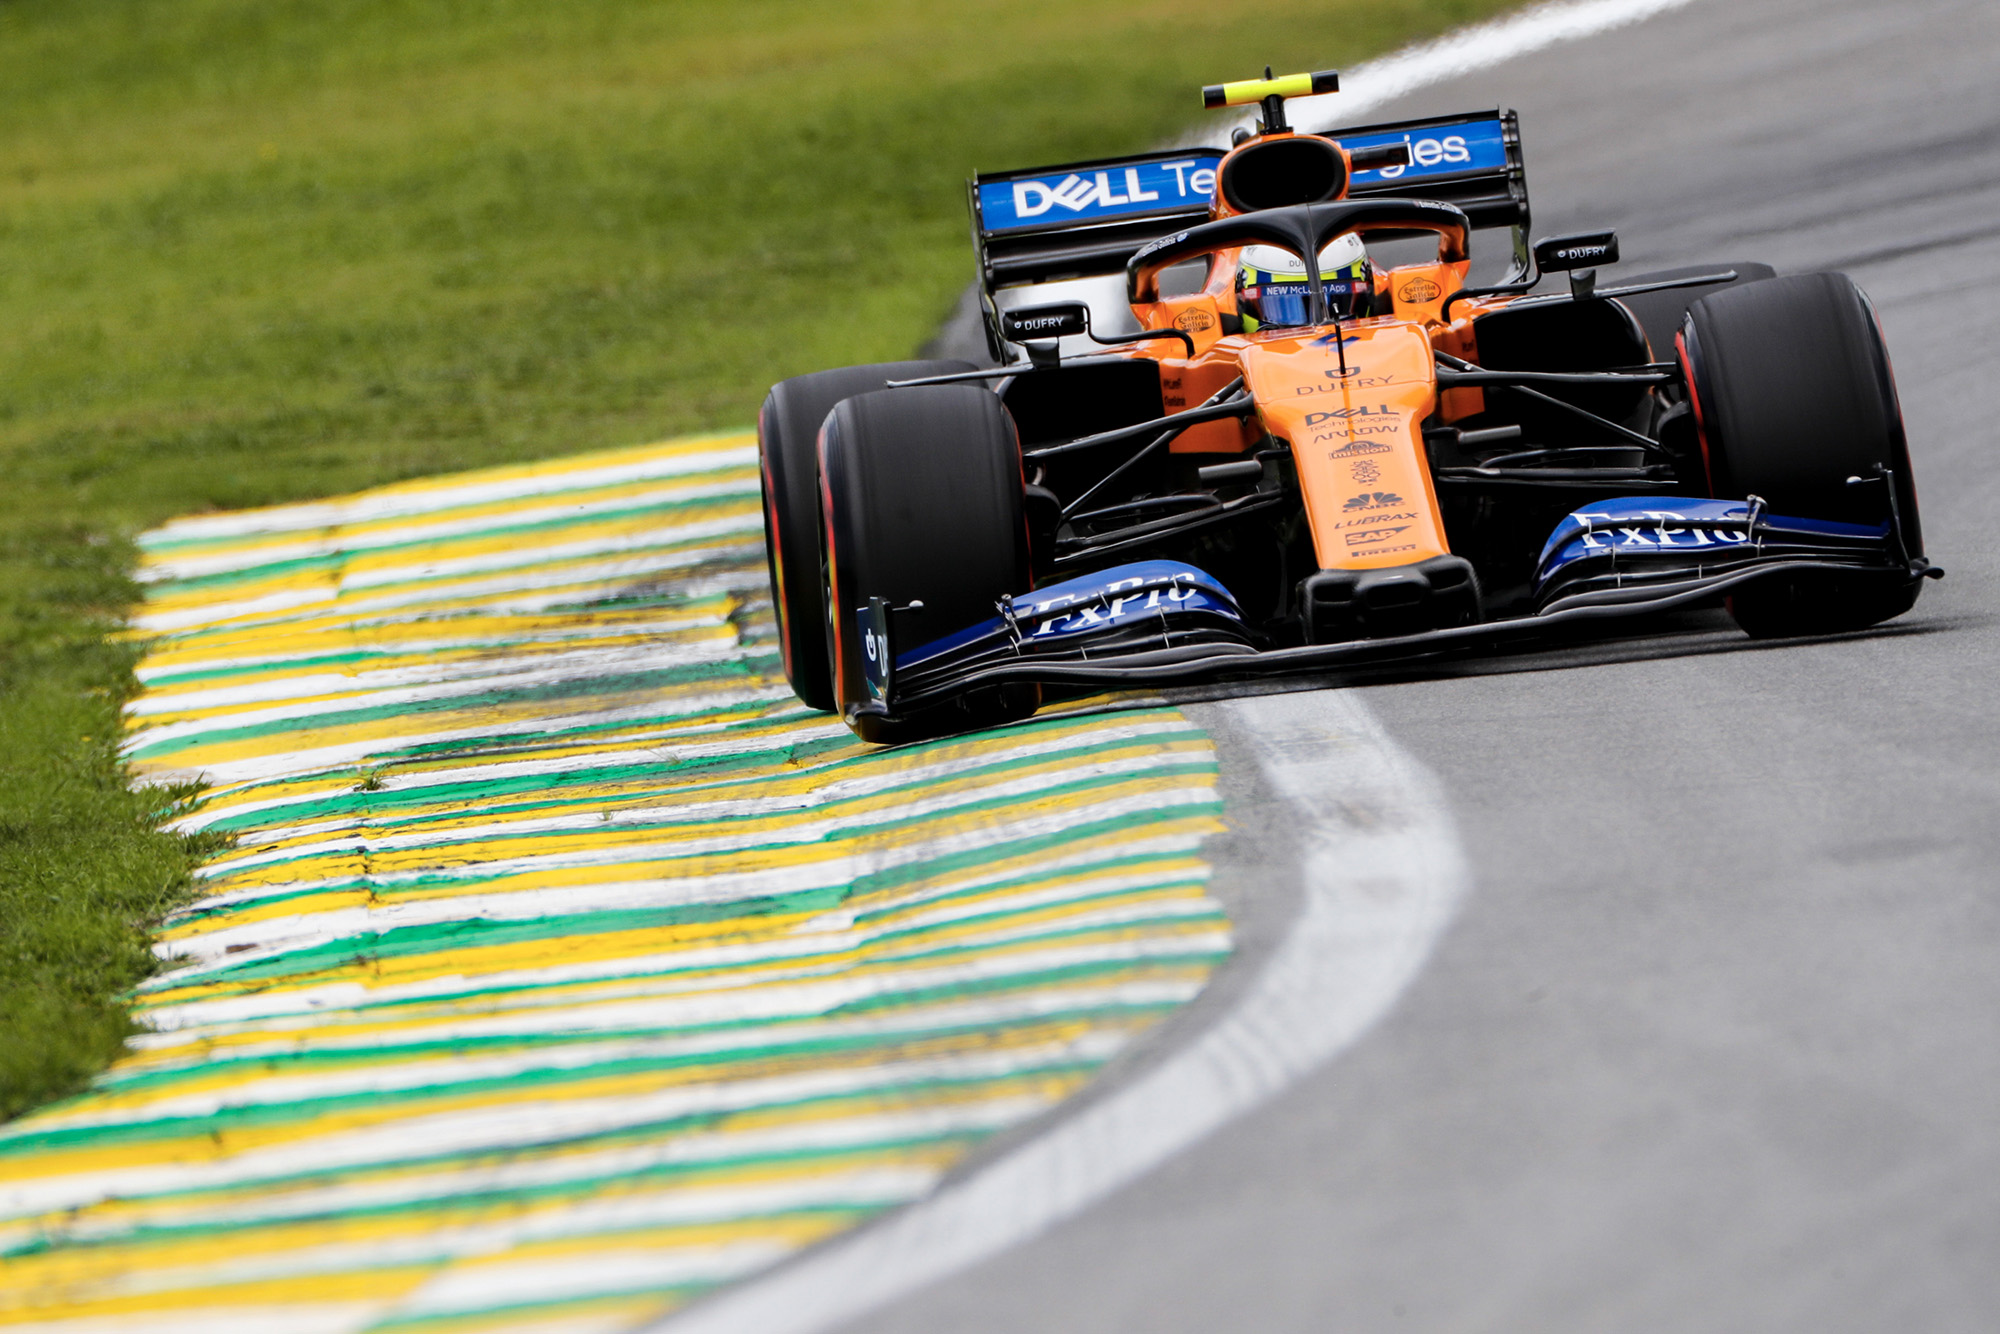 Lando Norris during the 2019 F1 Brazilian Grand Prix weekend